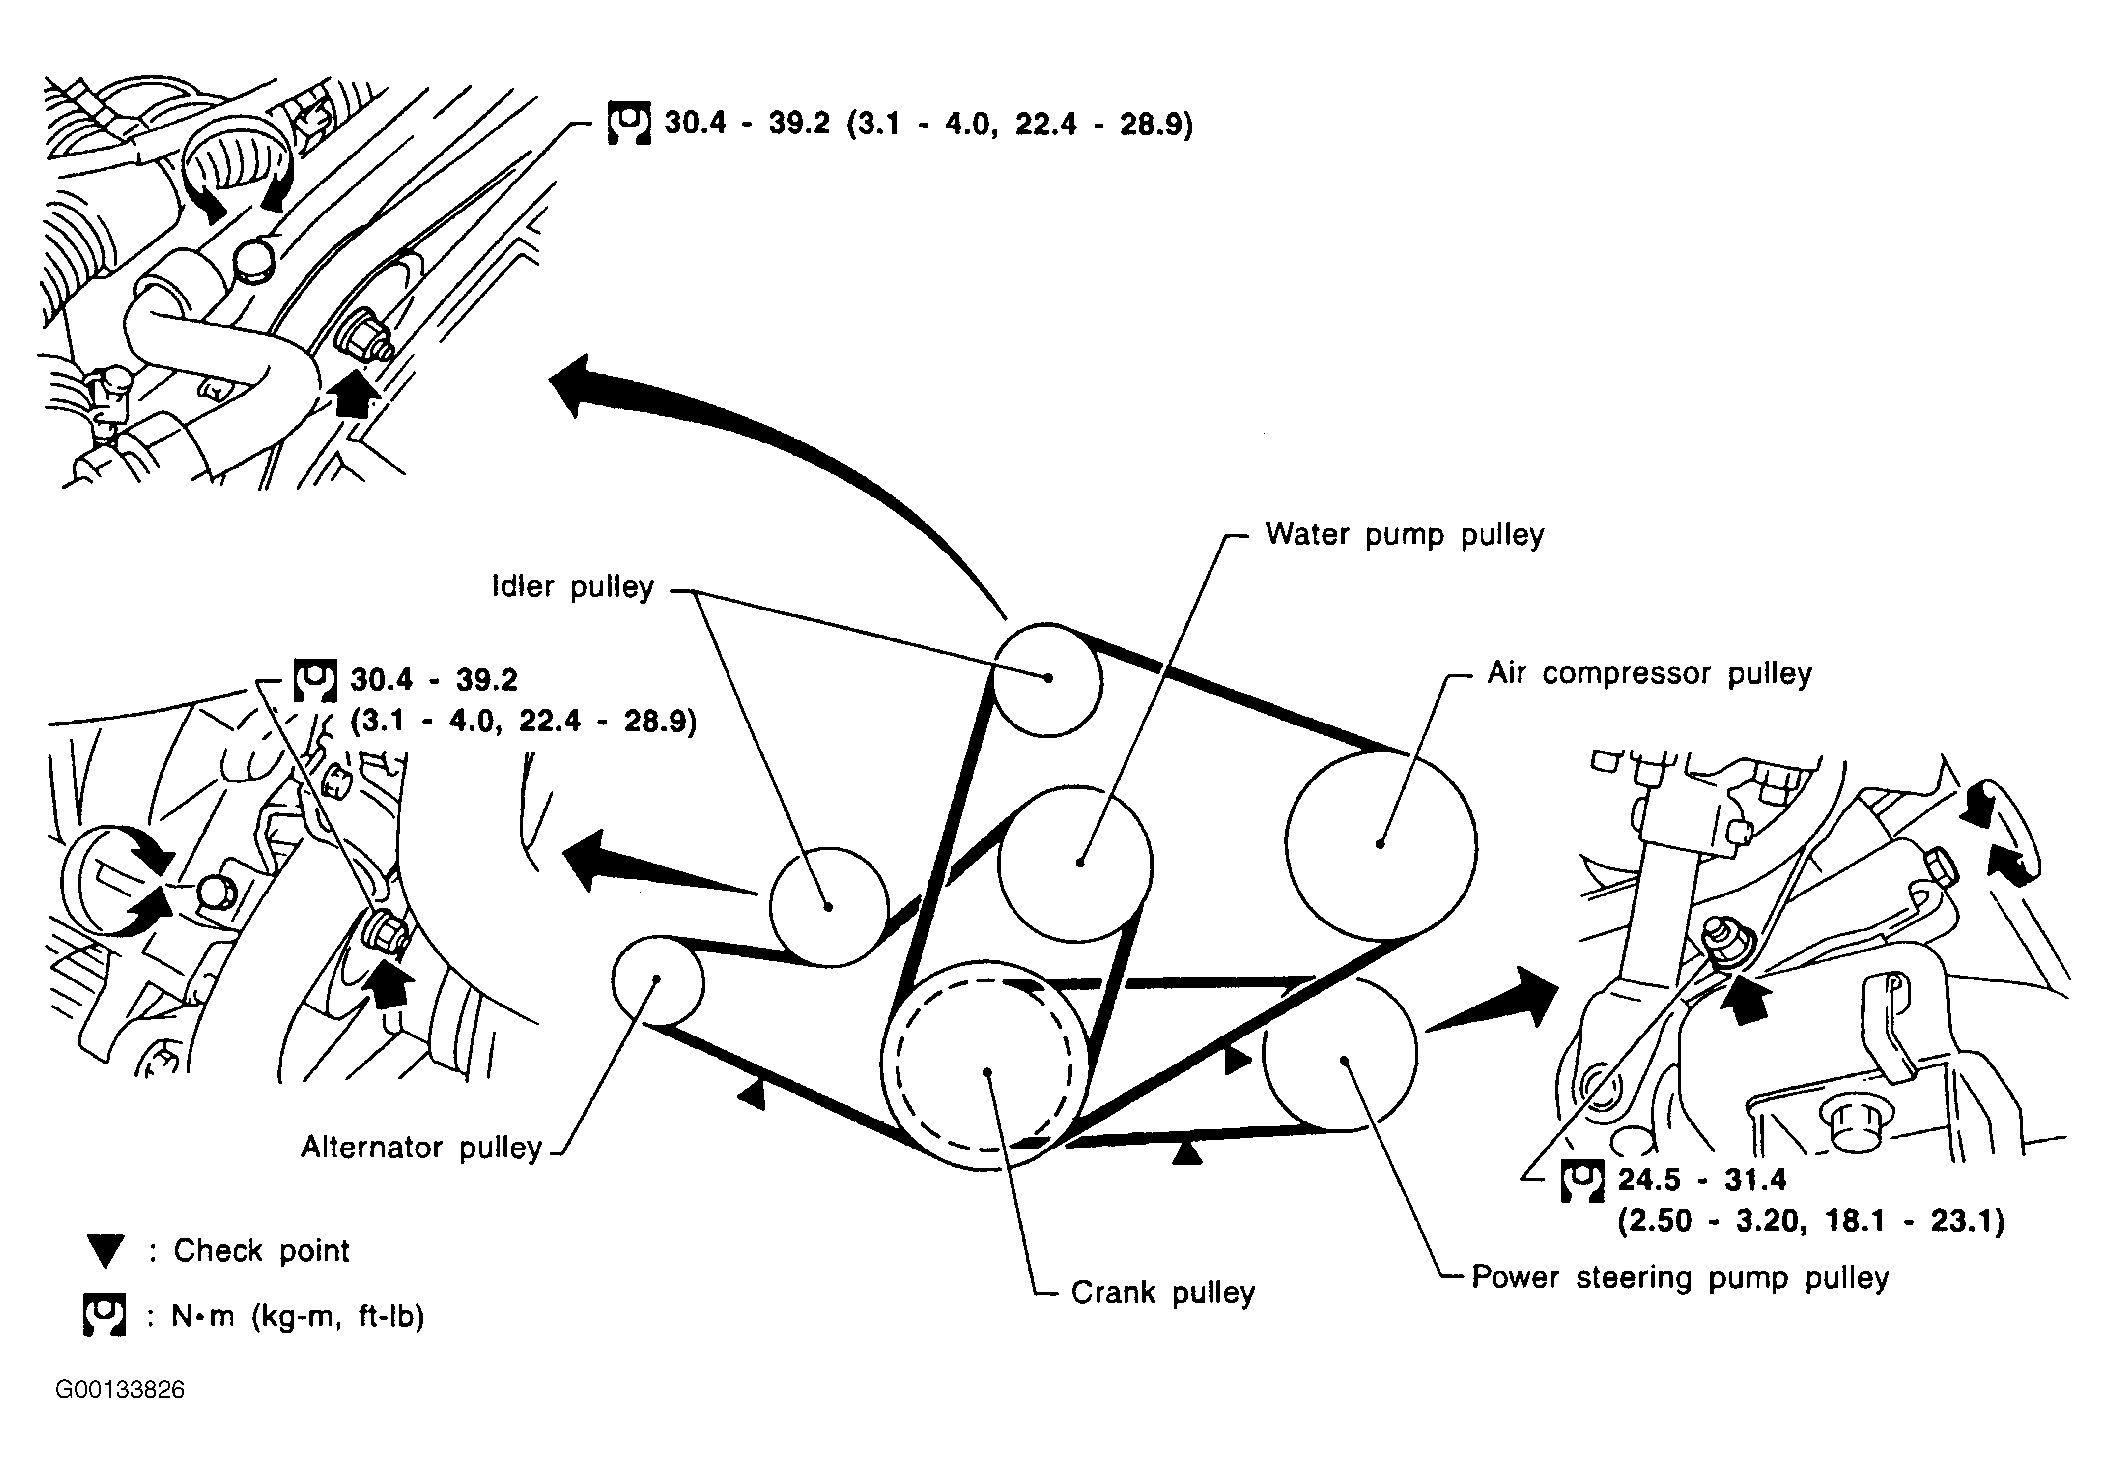 1999 Nissan Altima Engine Diagram In 2020 Nissan Altima Nissan Maxima Nissan